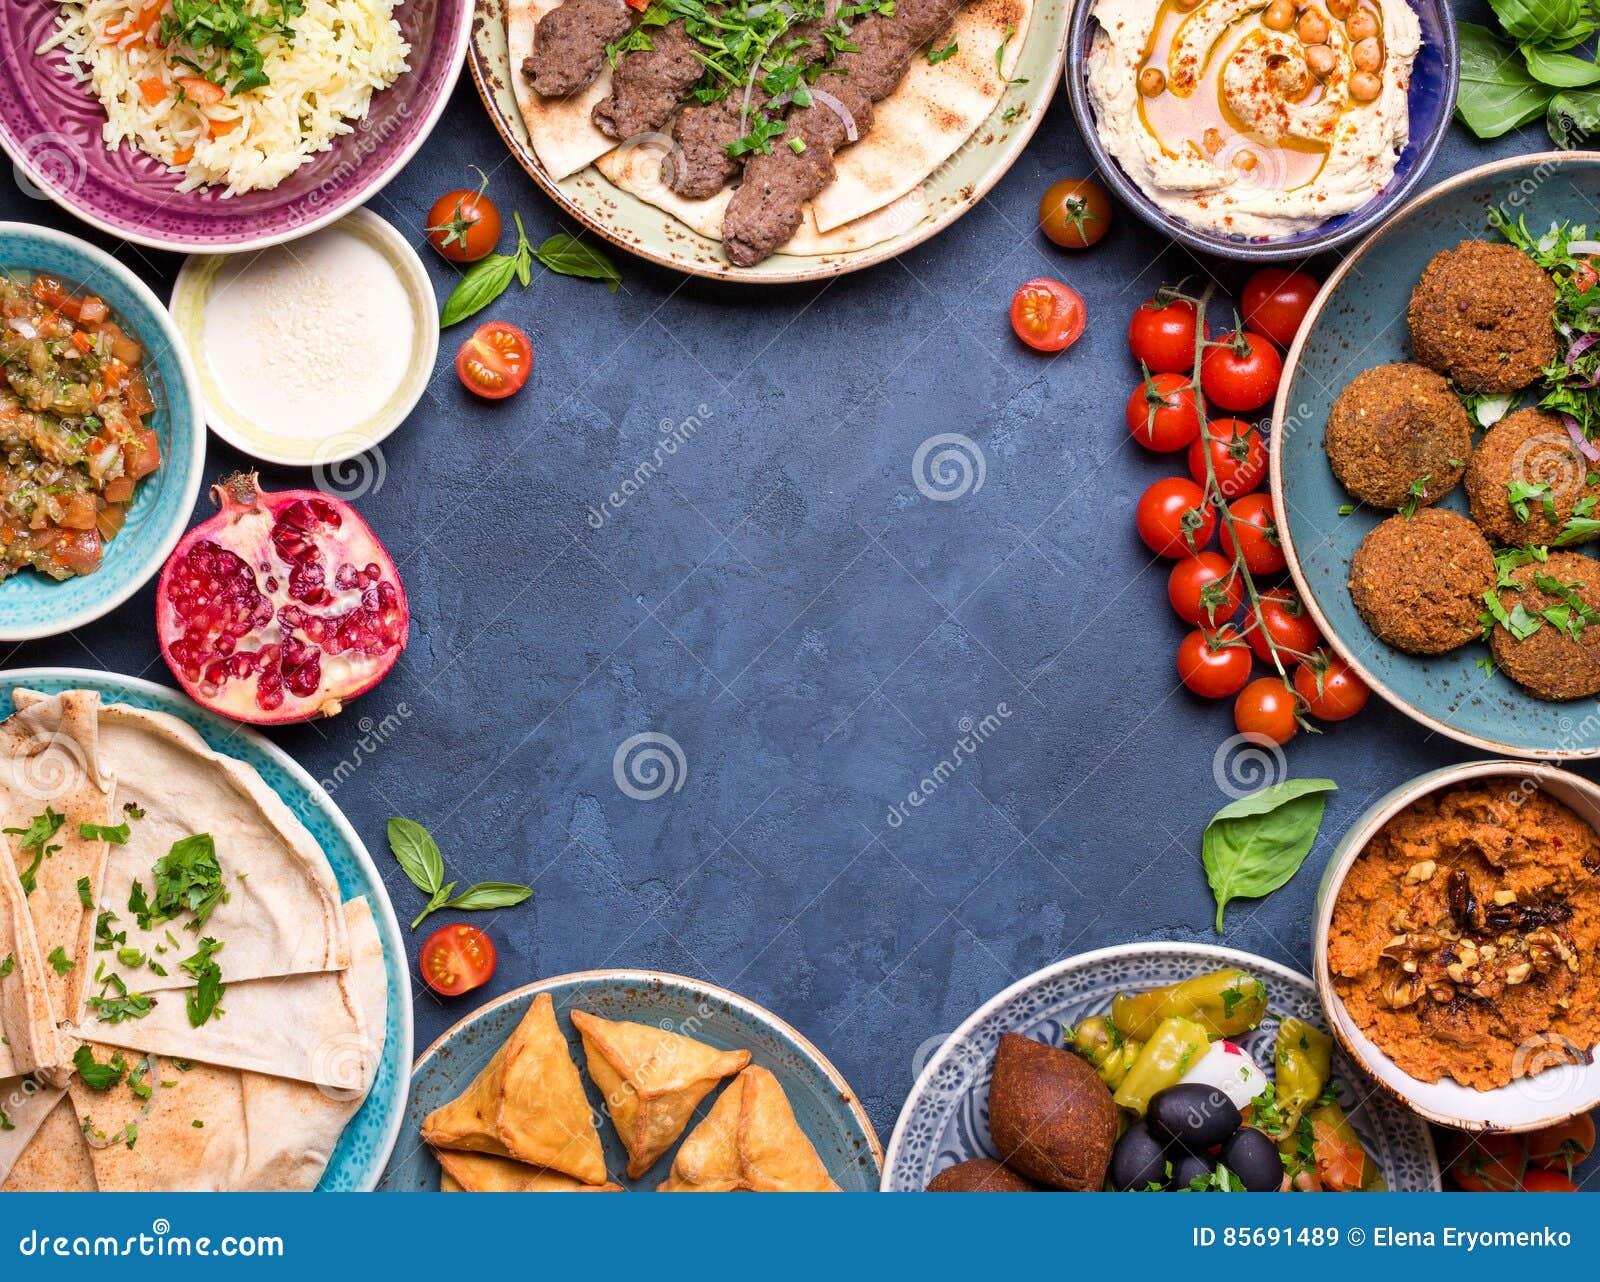 Арабская предпосылка блюд